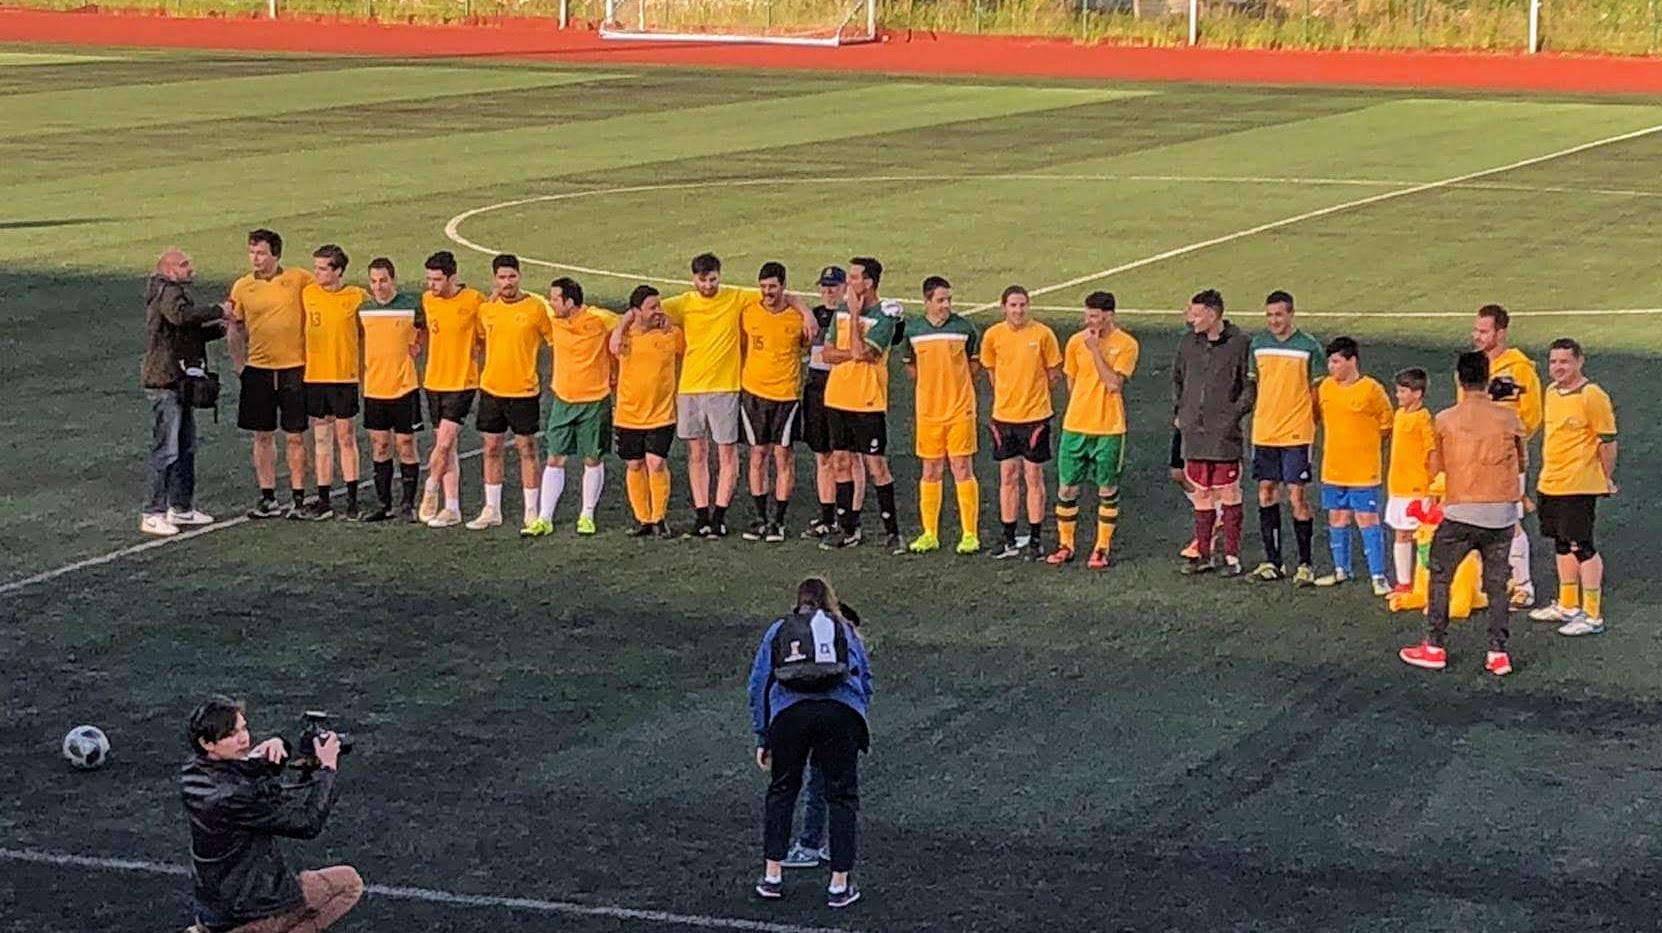 Match v France in Kazan